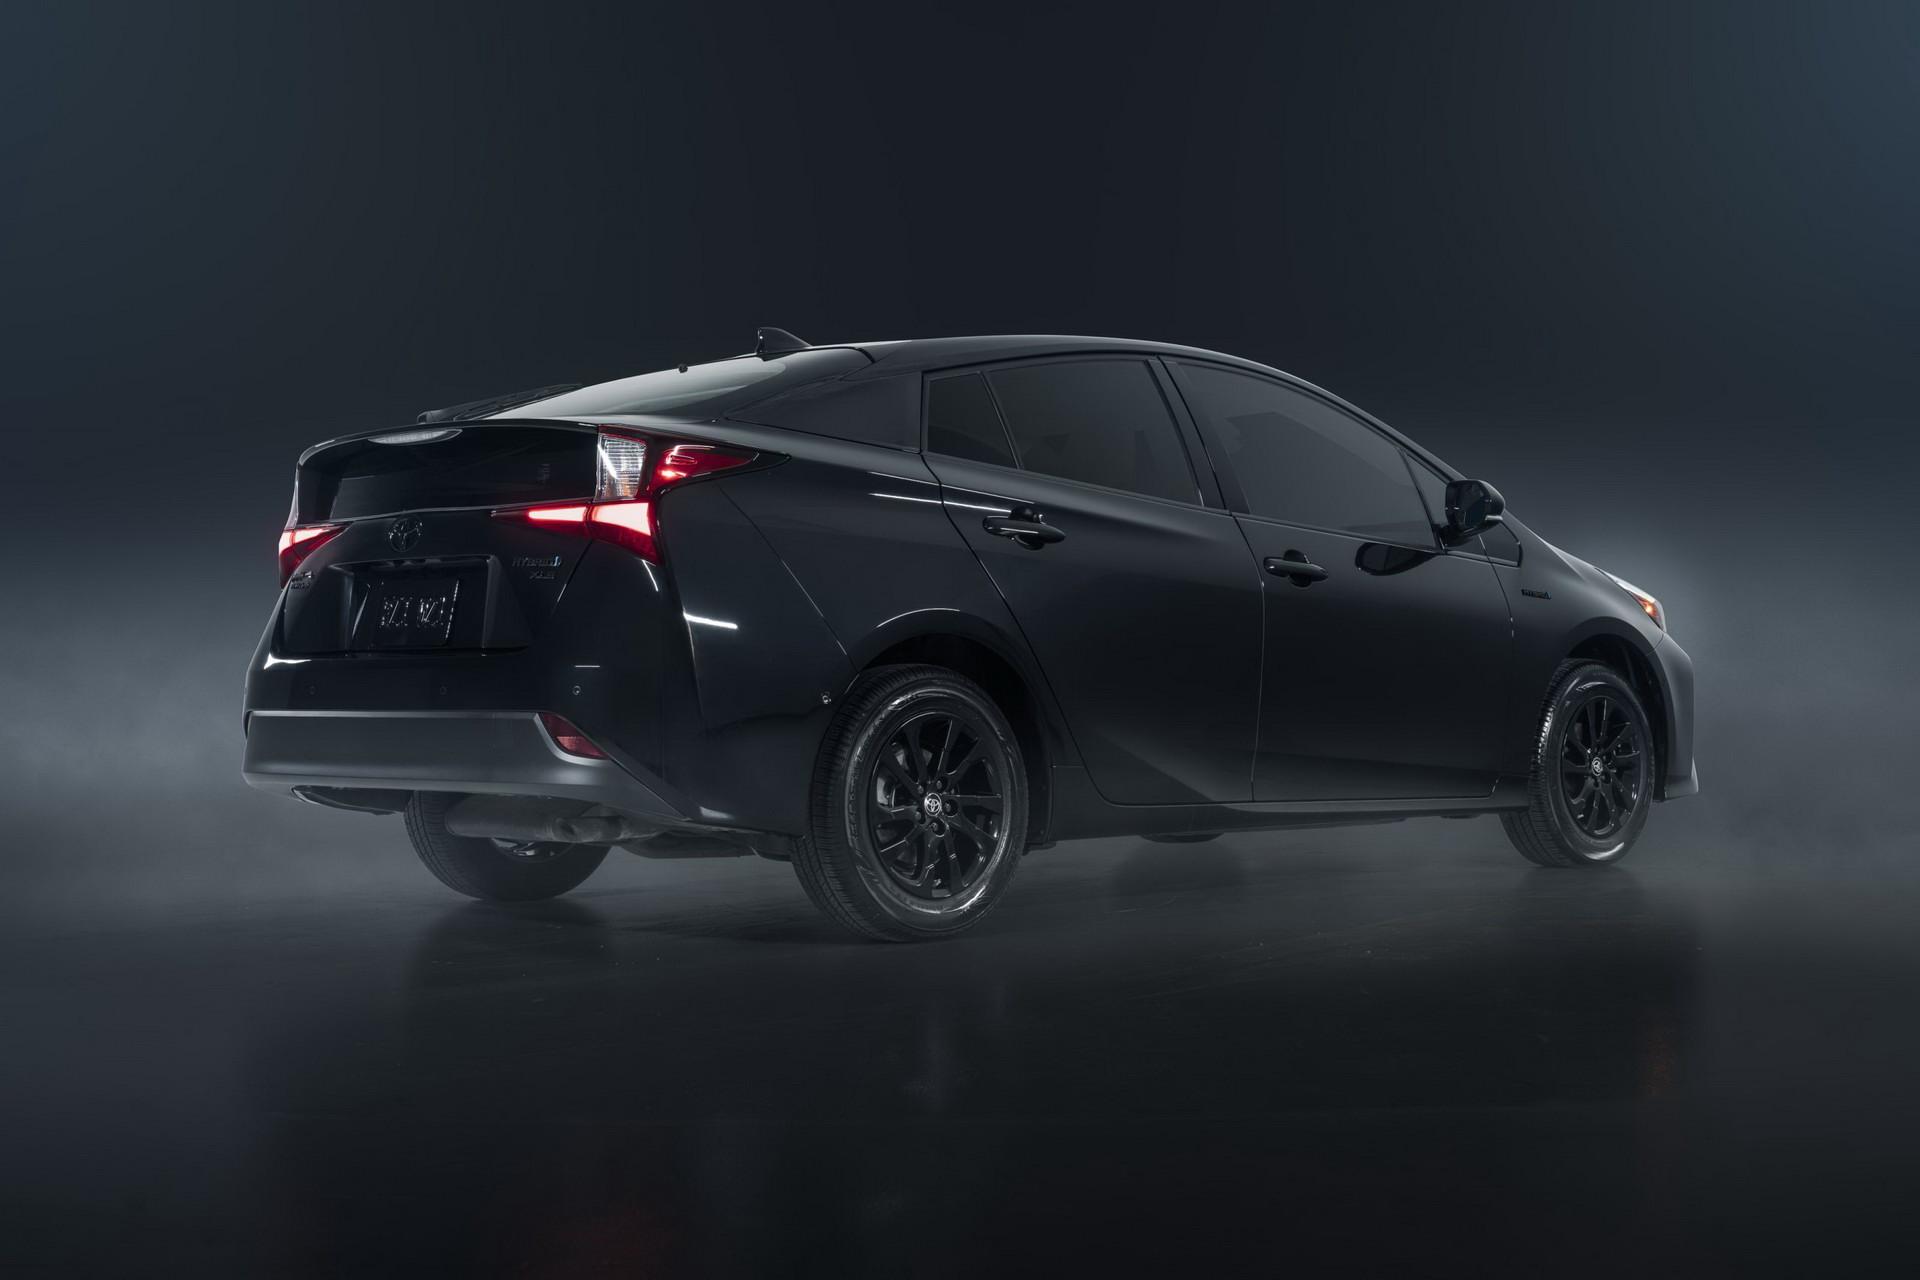 Toyota-Prius-Nightshade-Edition-5